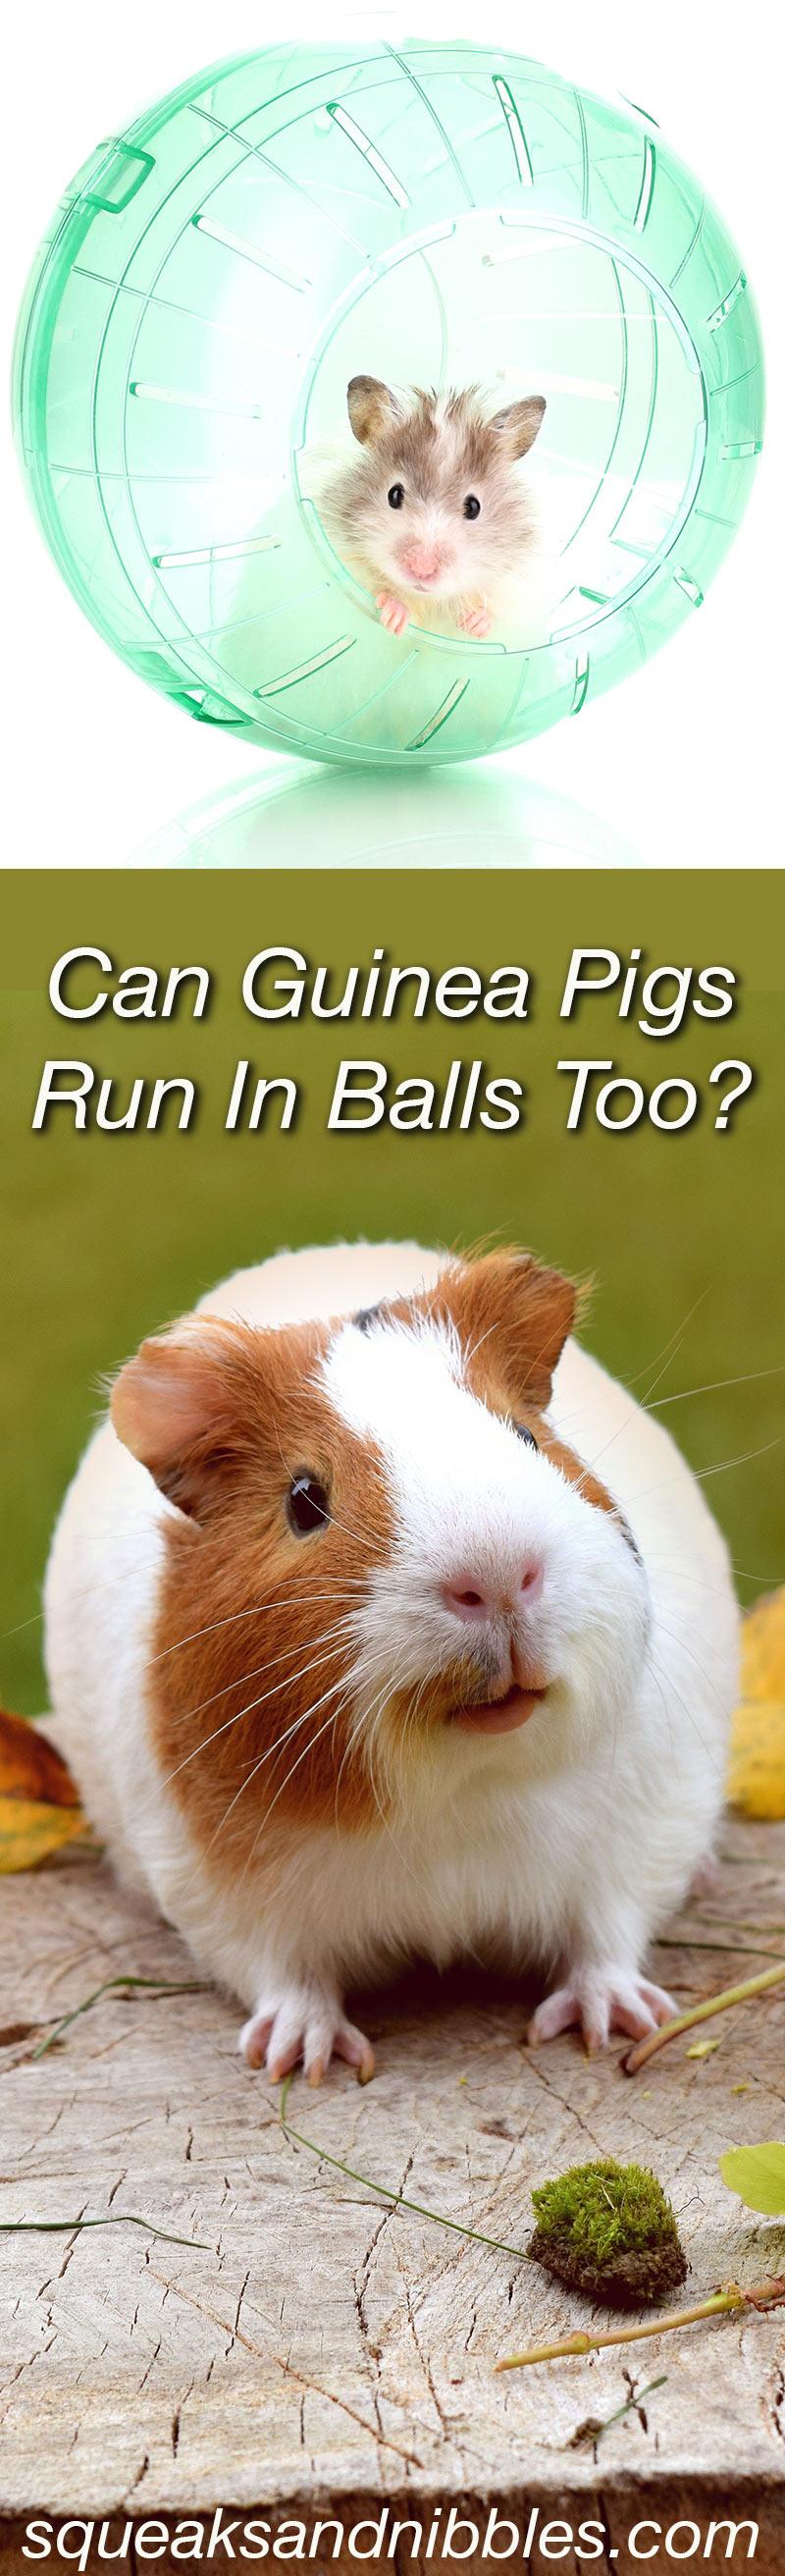 Can Guinea Pigs Run In Balls?